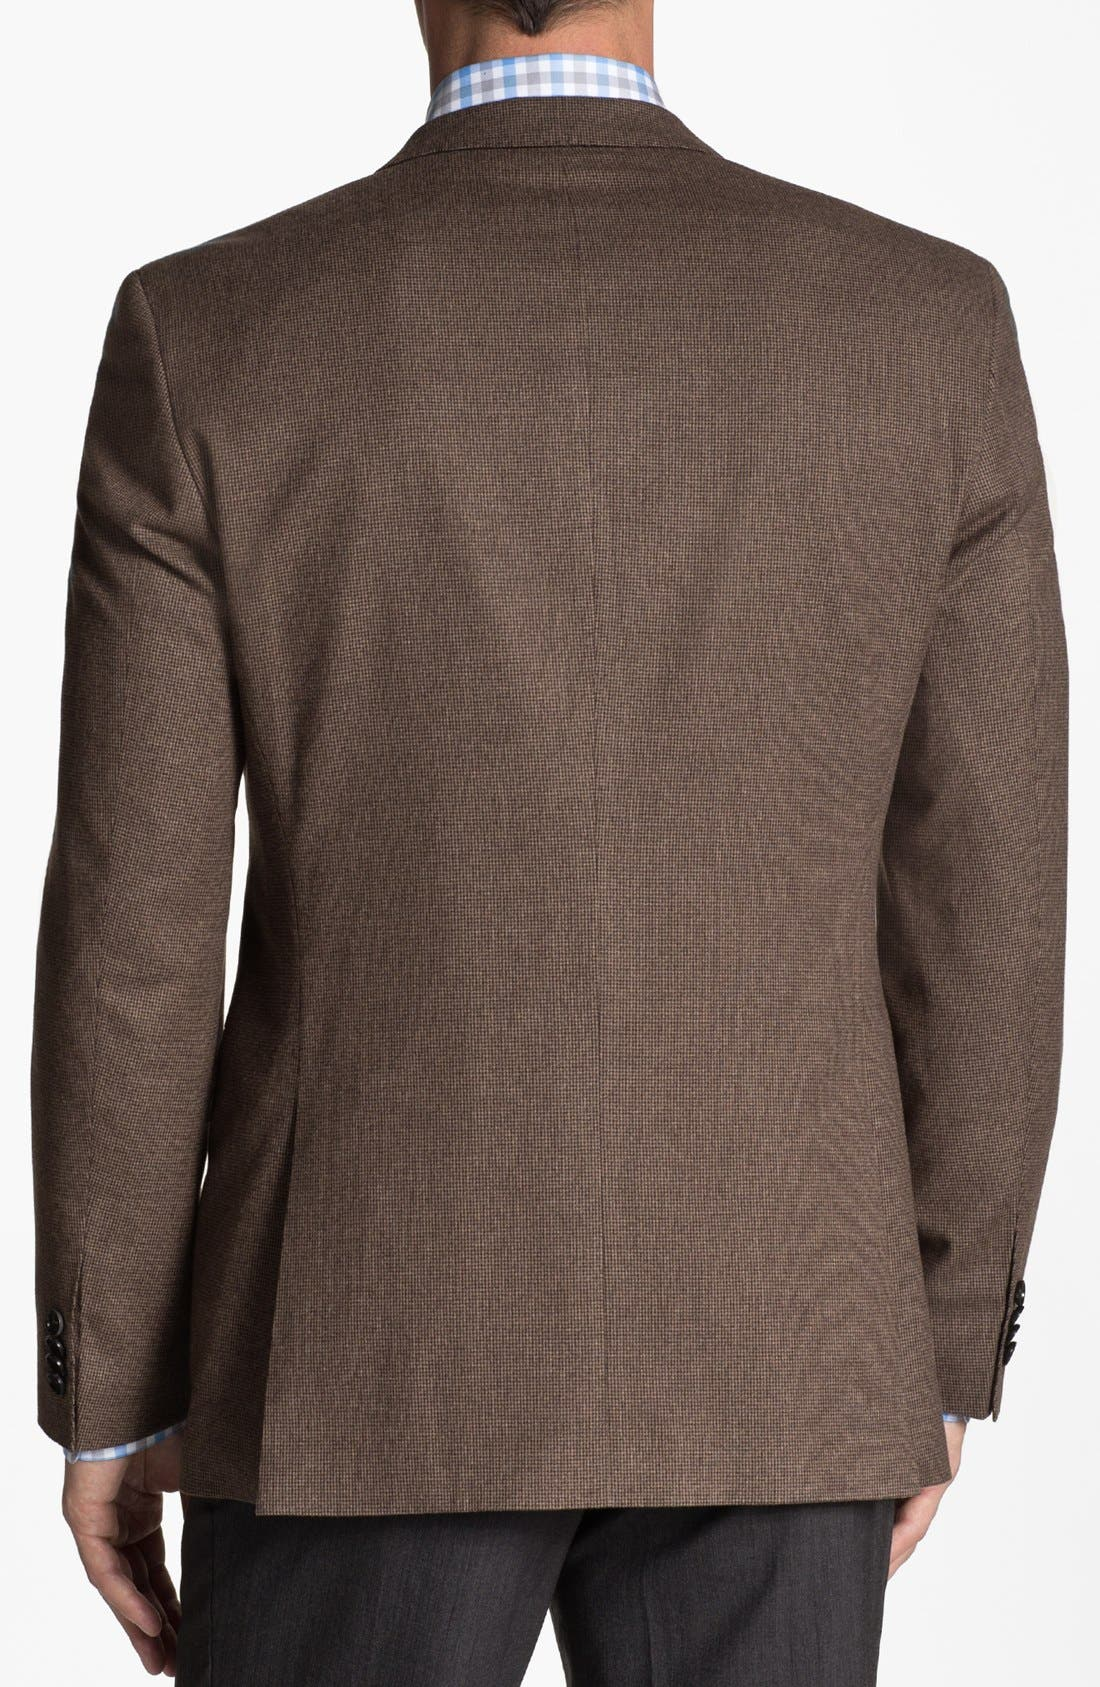 Alternate Image 2  - BOSS HUGO BOSS 'Coastes' Sportcoat